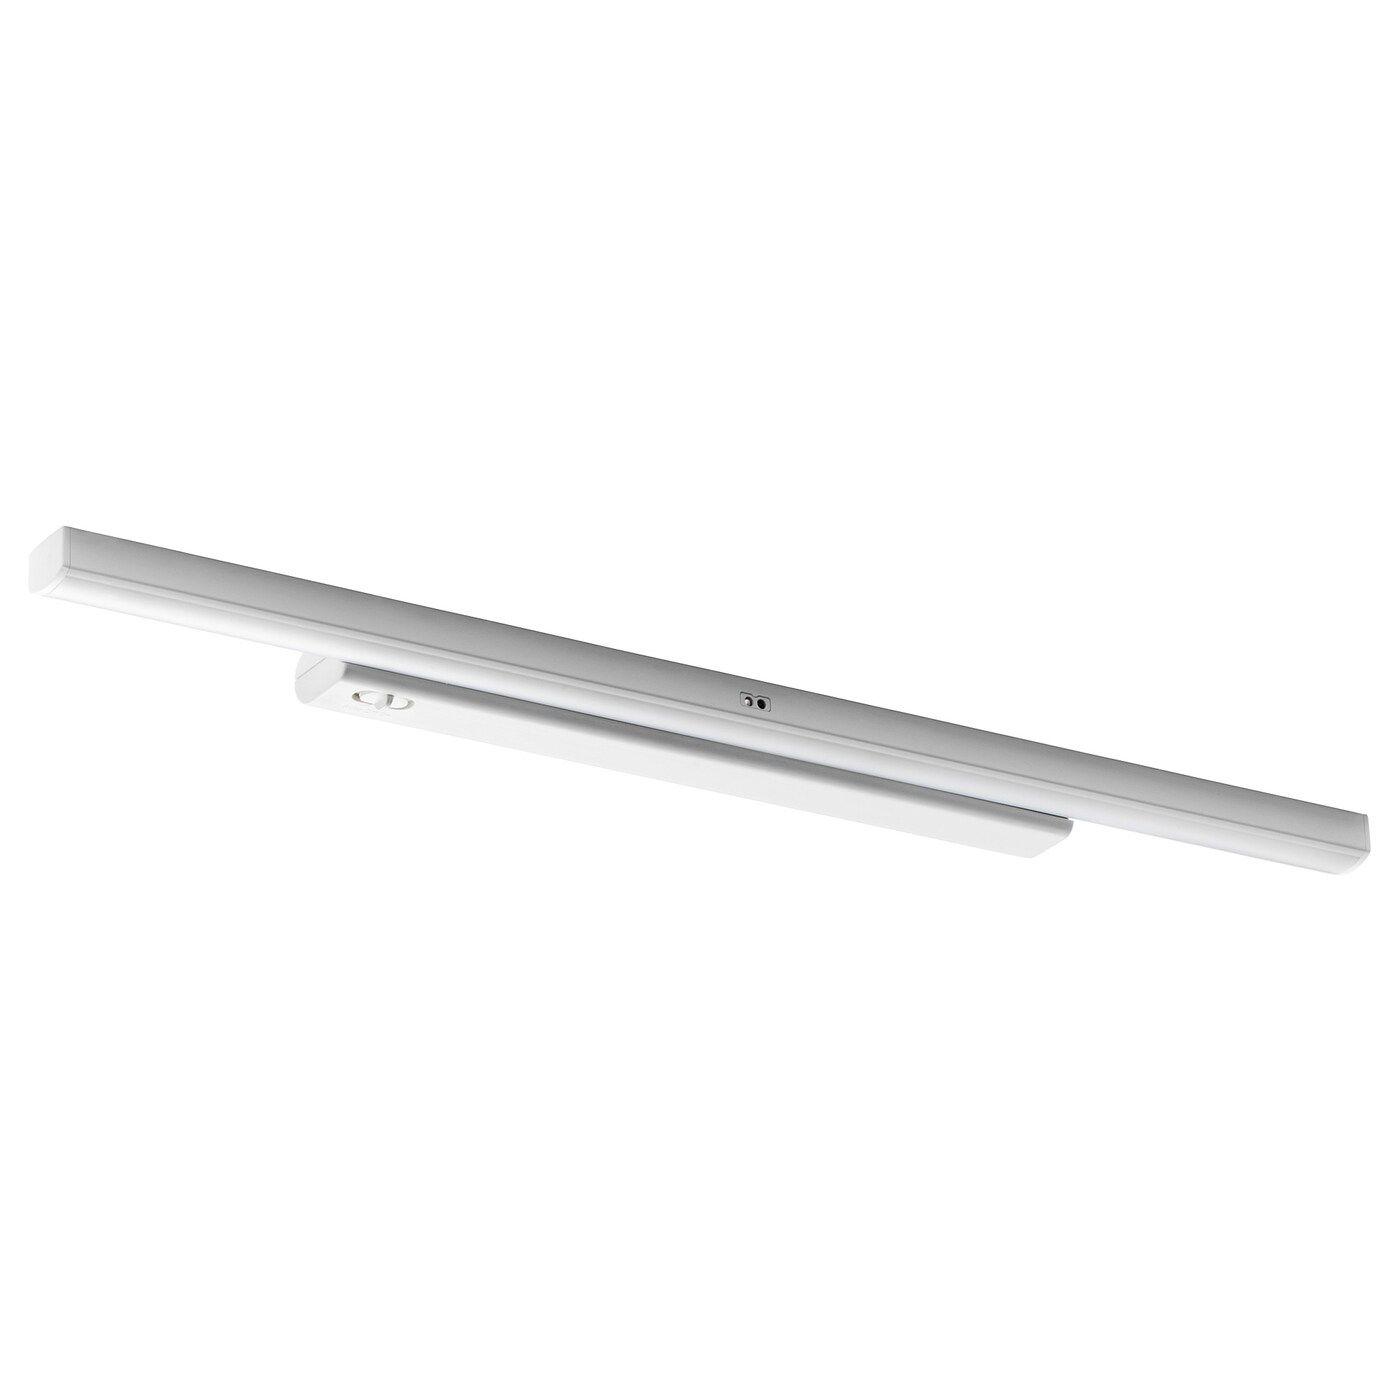 Stotta Led Lichtleiste Schrank Sensor Batteriebetrieben Weiss Lichtleiste Led Lichtleiste Und Led